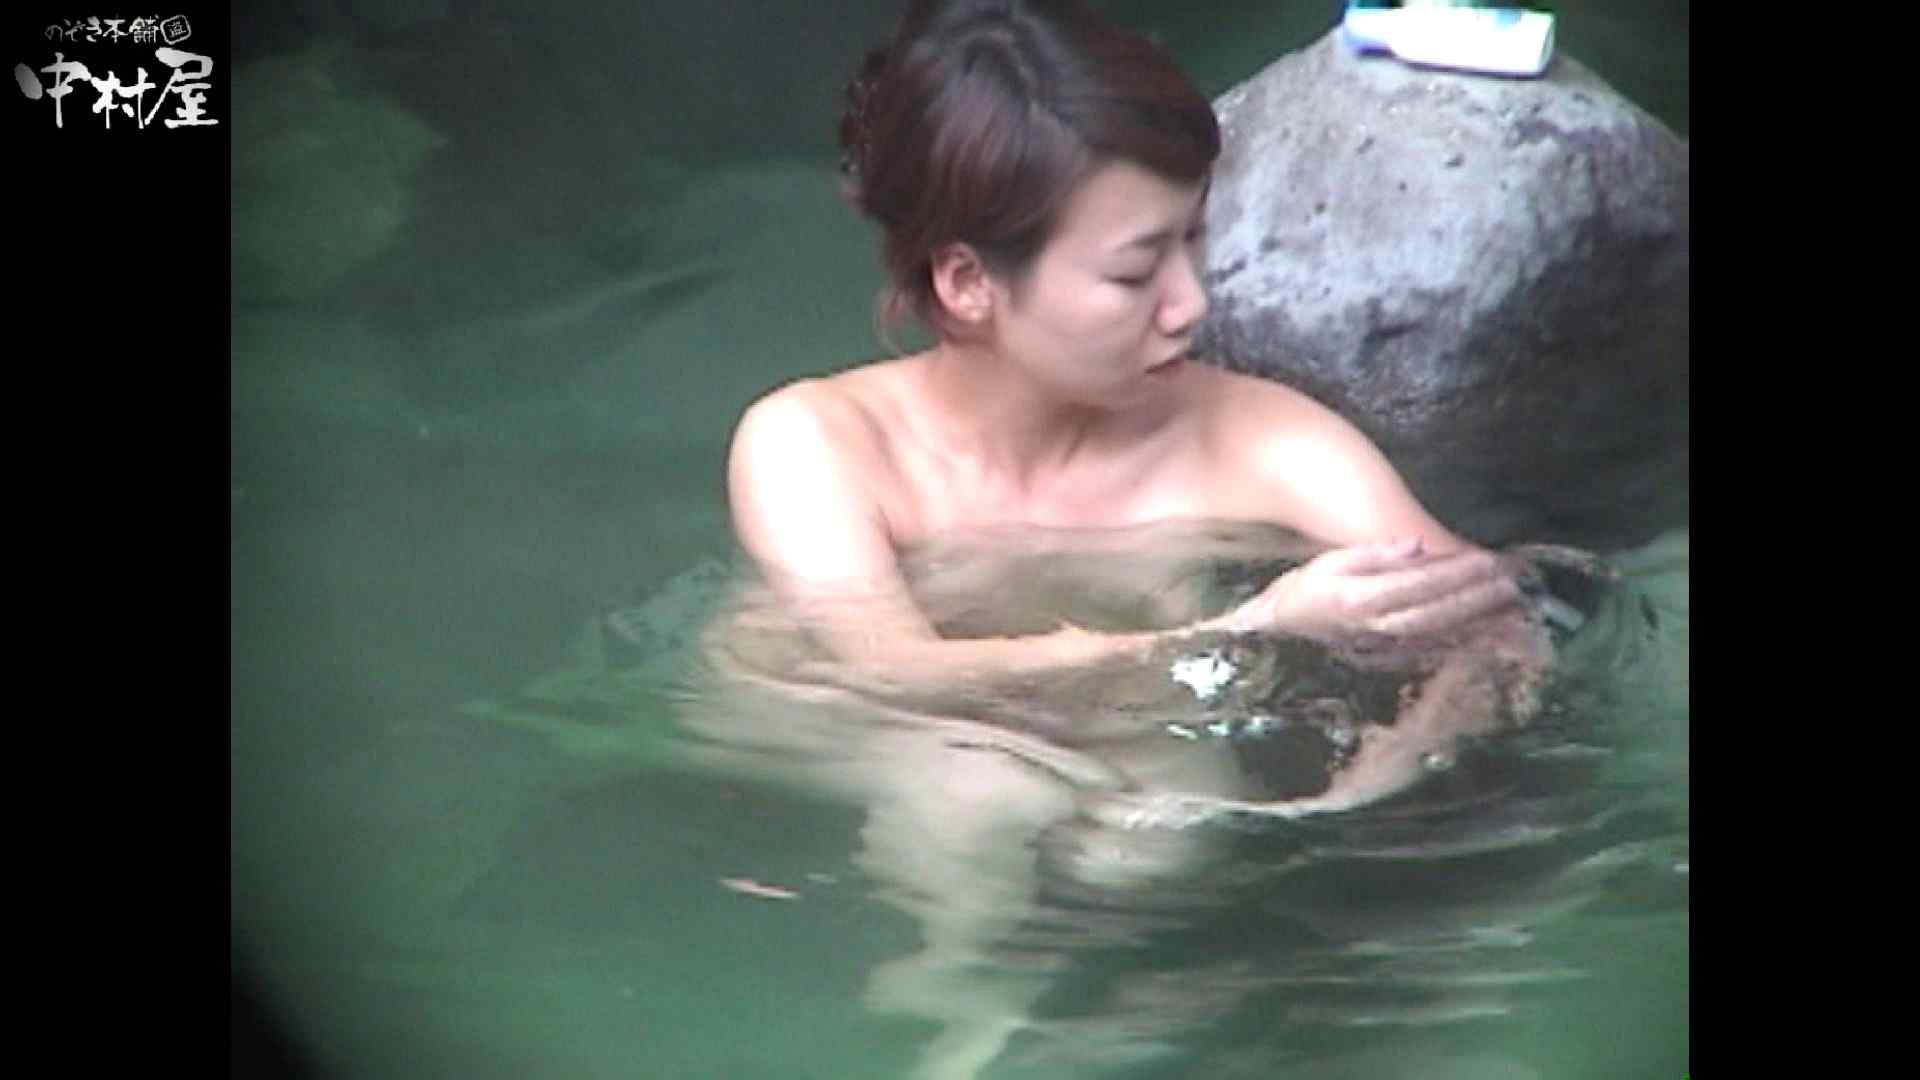 Aquaな露天風呂Vol.951 露天風呂 隠し撮りオマンコ動画紹介 80連発 29